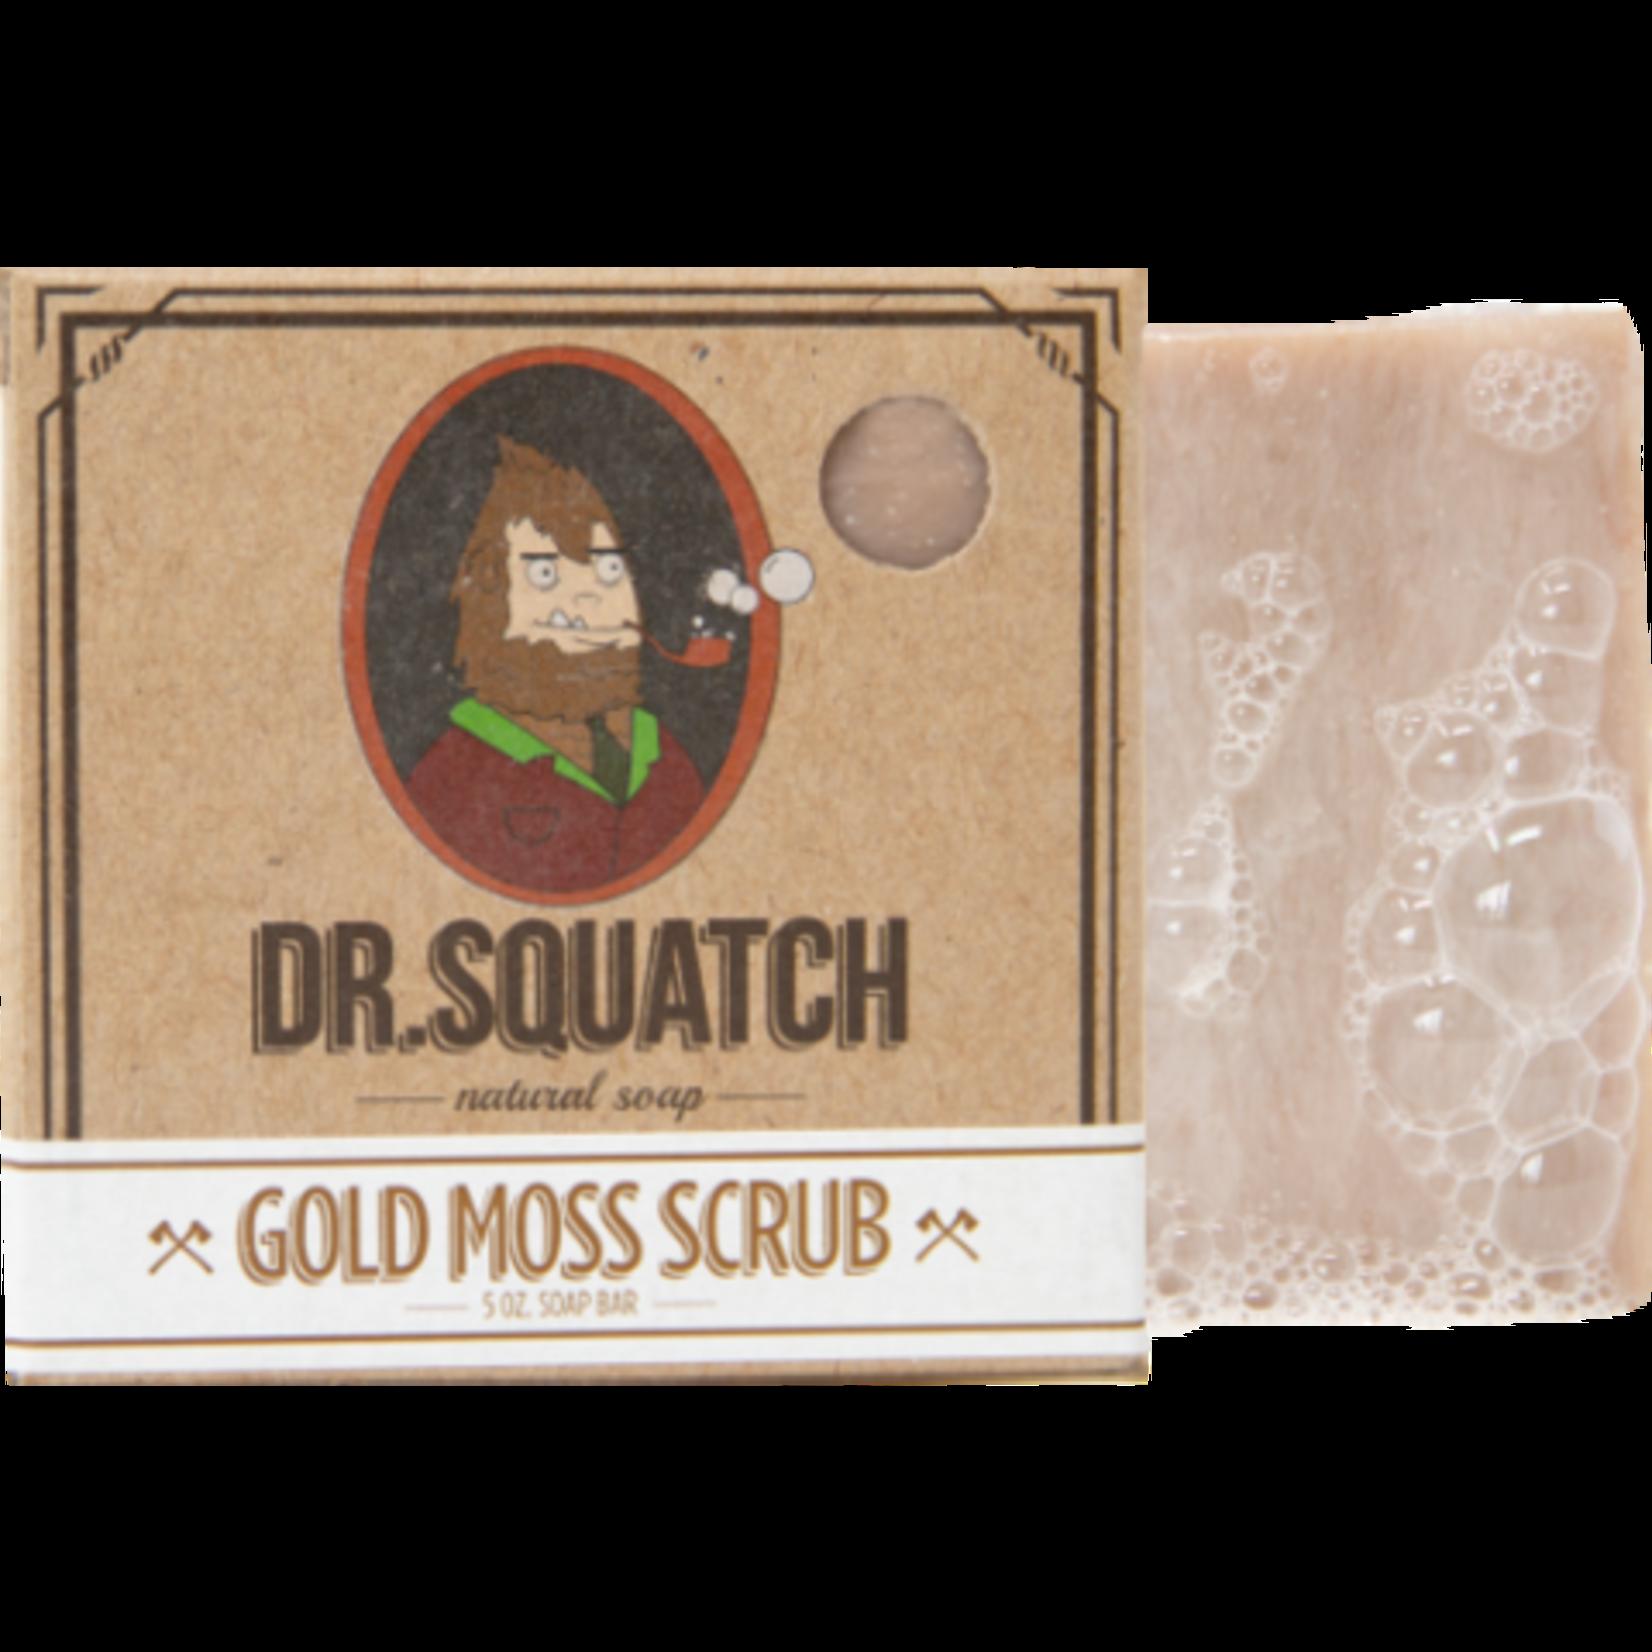 Dr Squatch Bar Soap 5 oz - Gold Moss Scrub